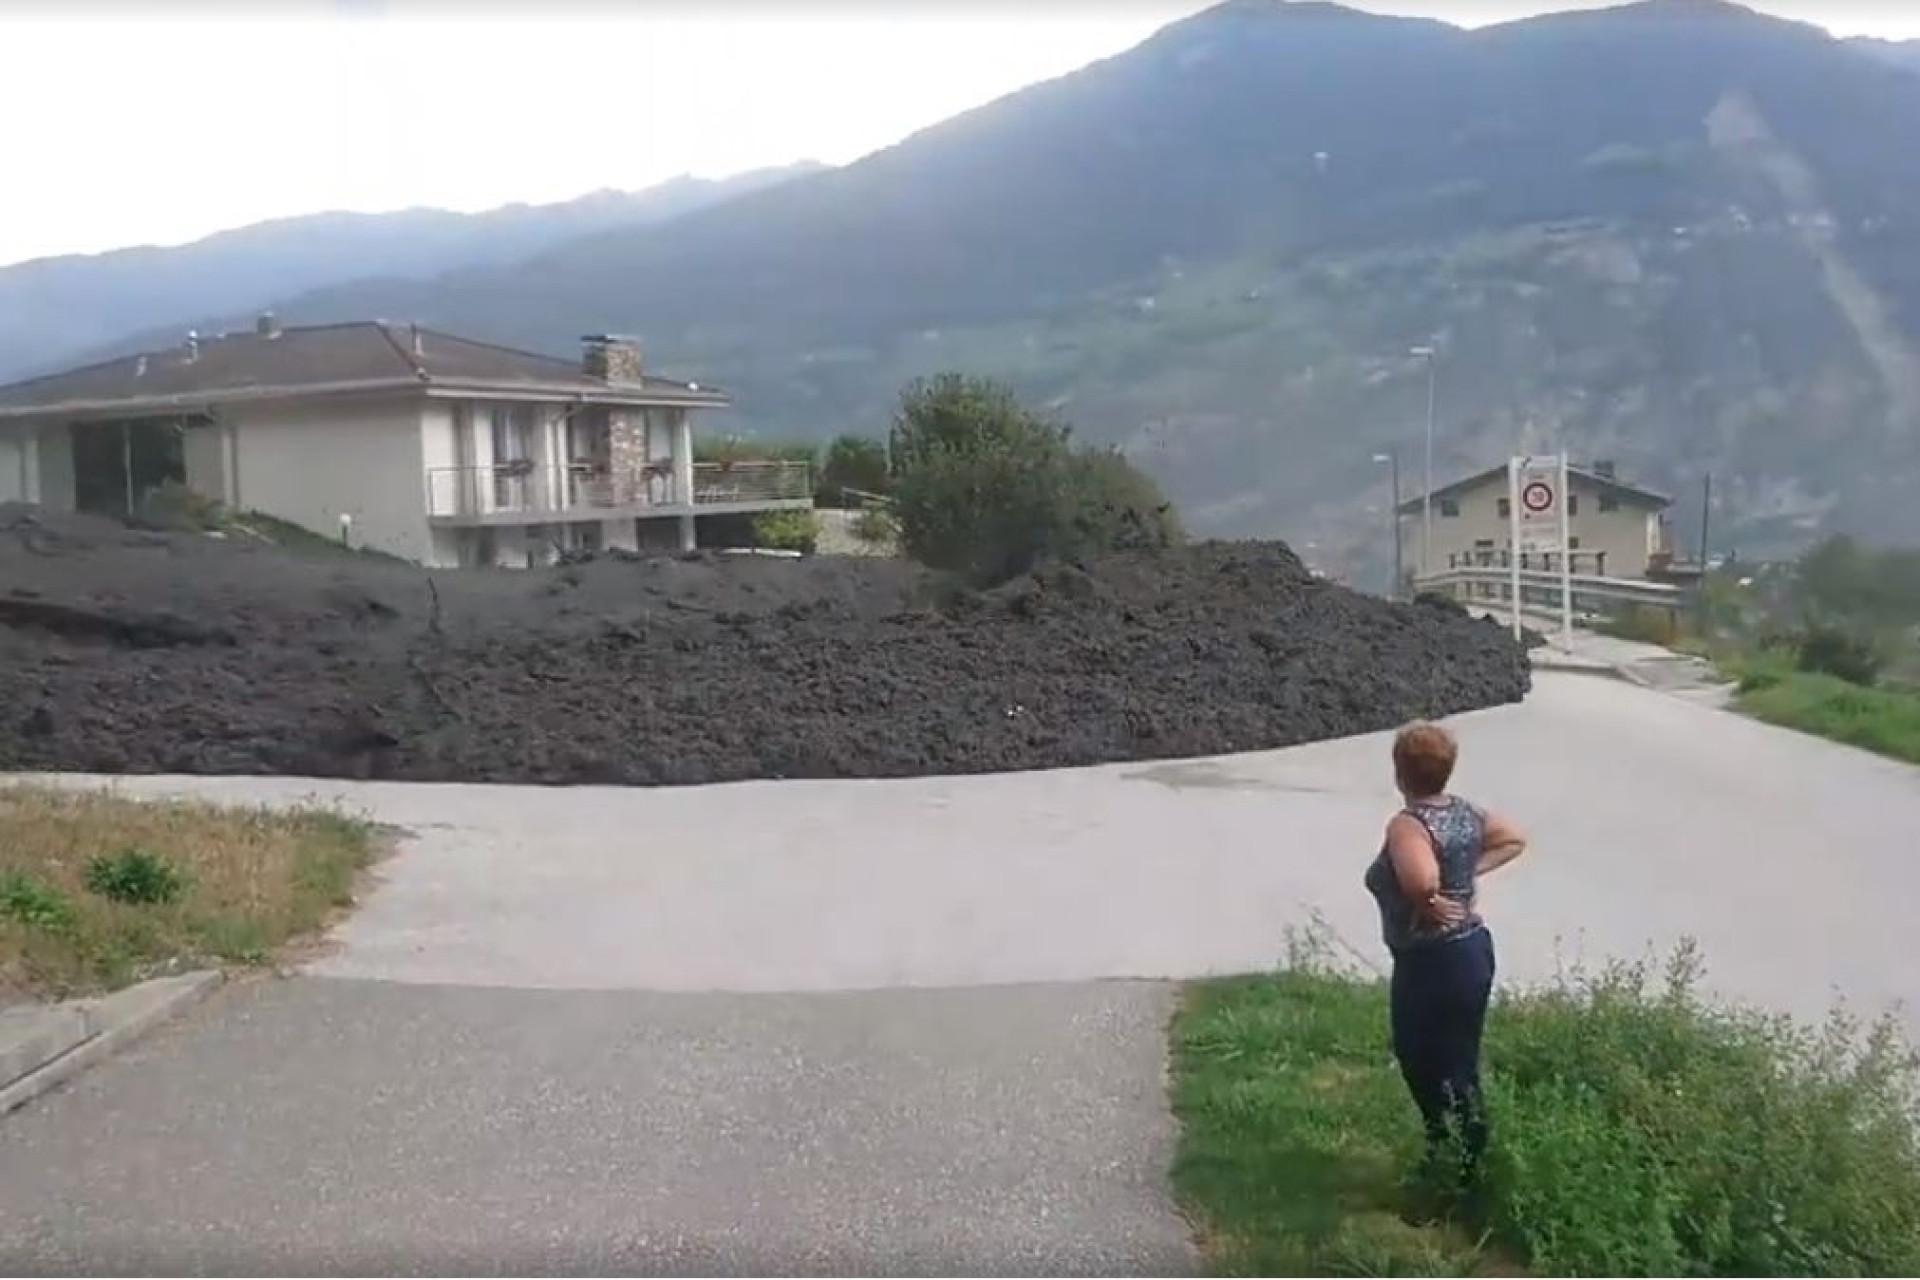 'Onda' de lama invade vila suíça após deslizamento de terras